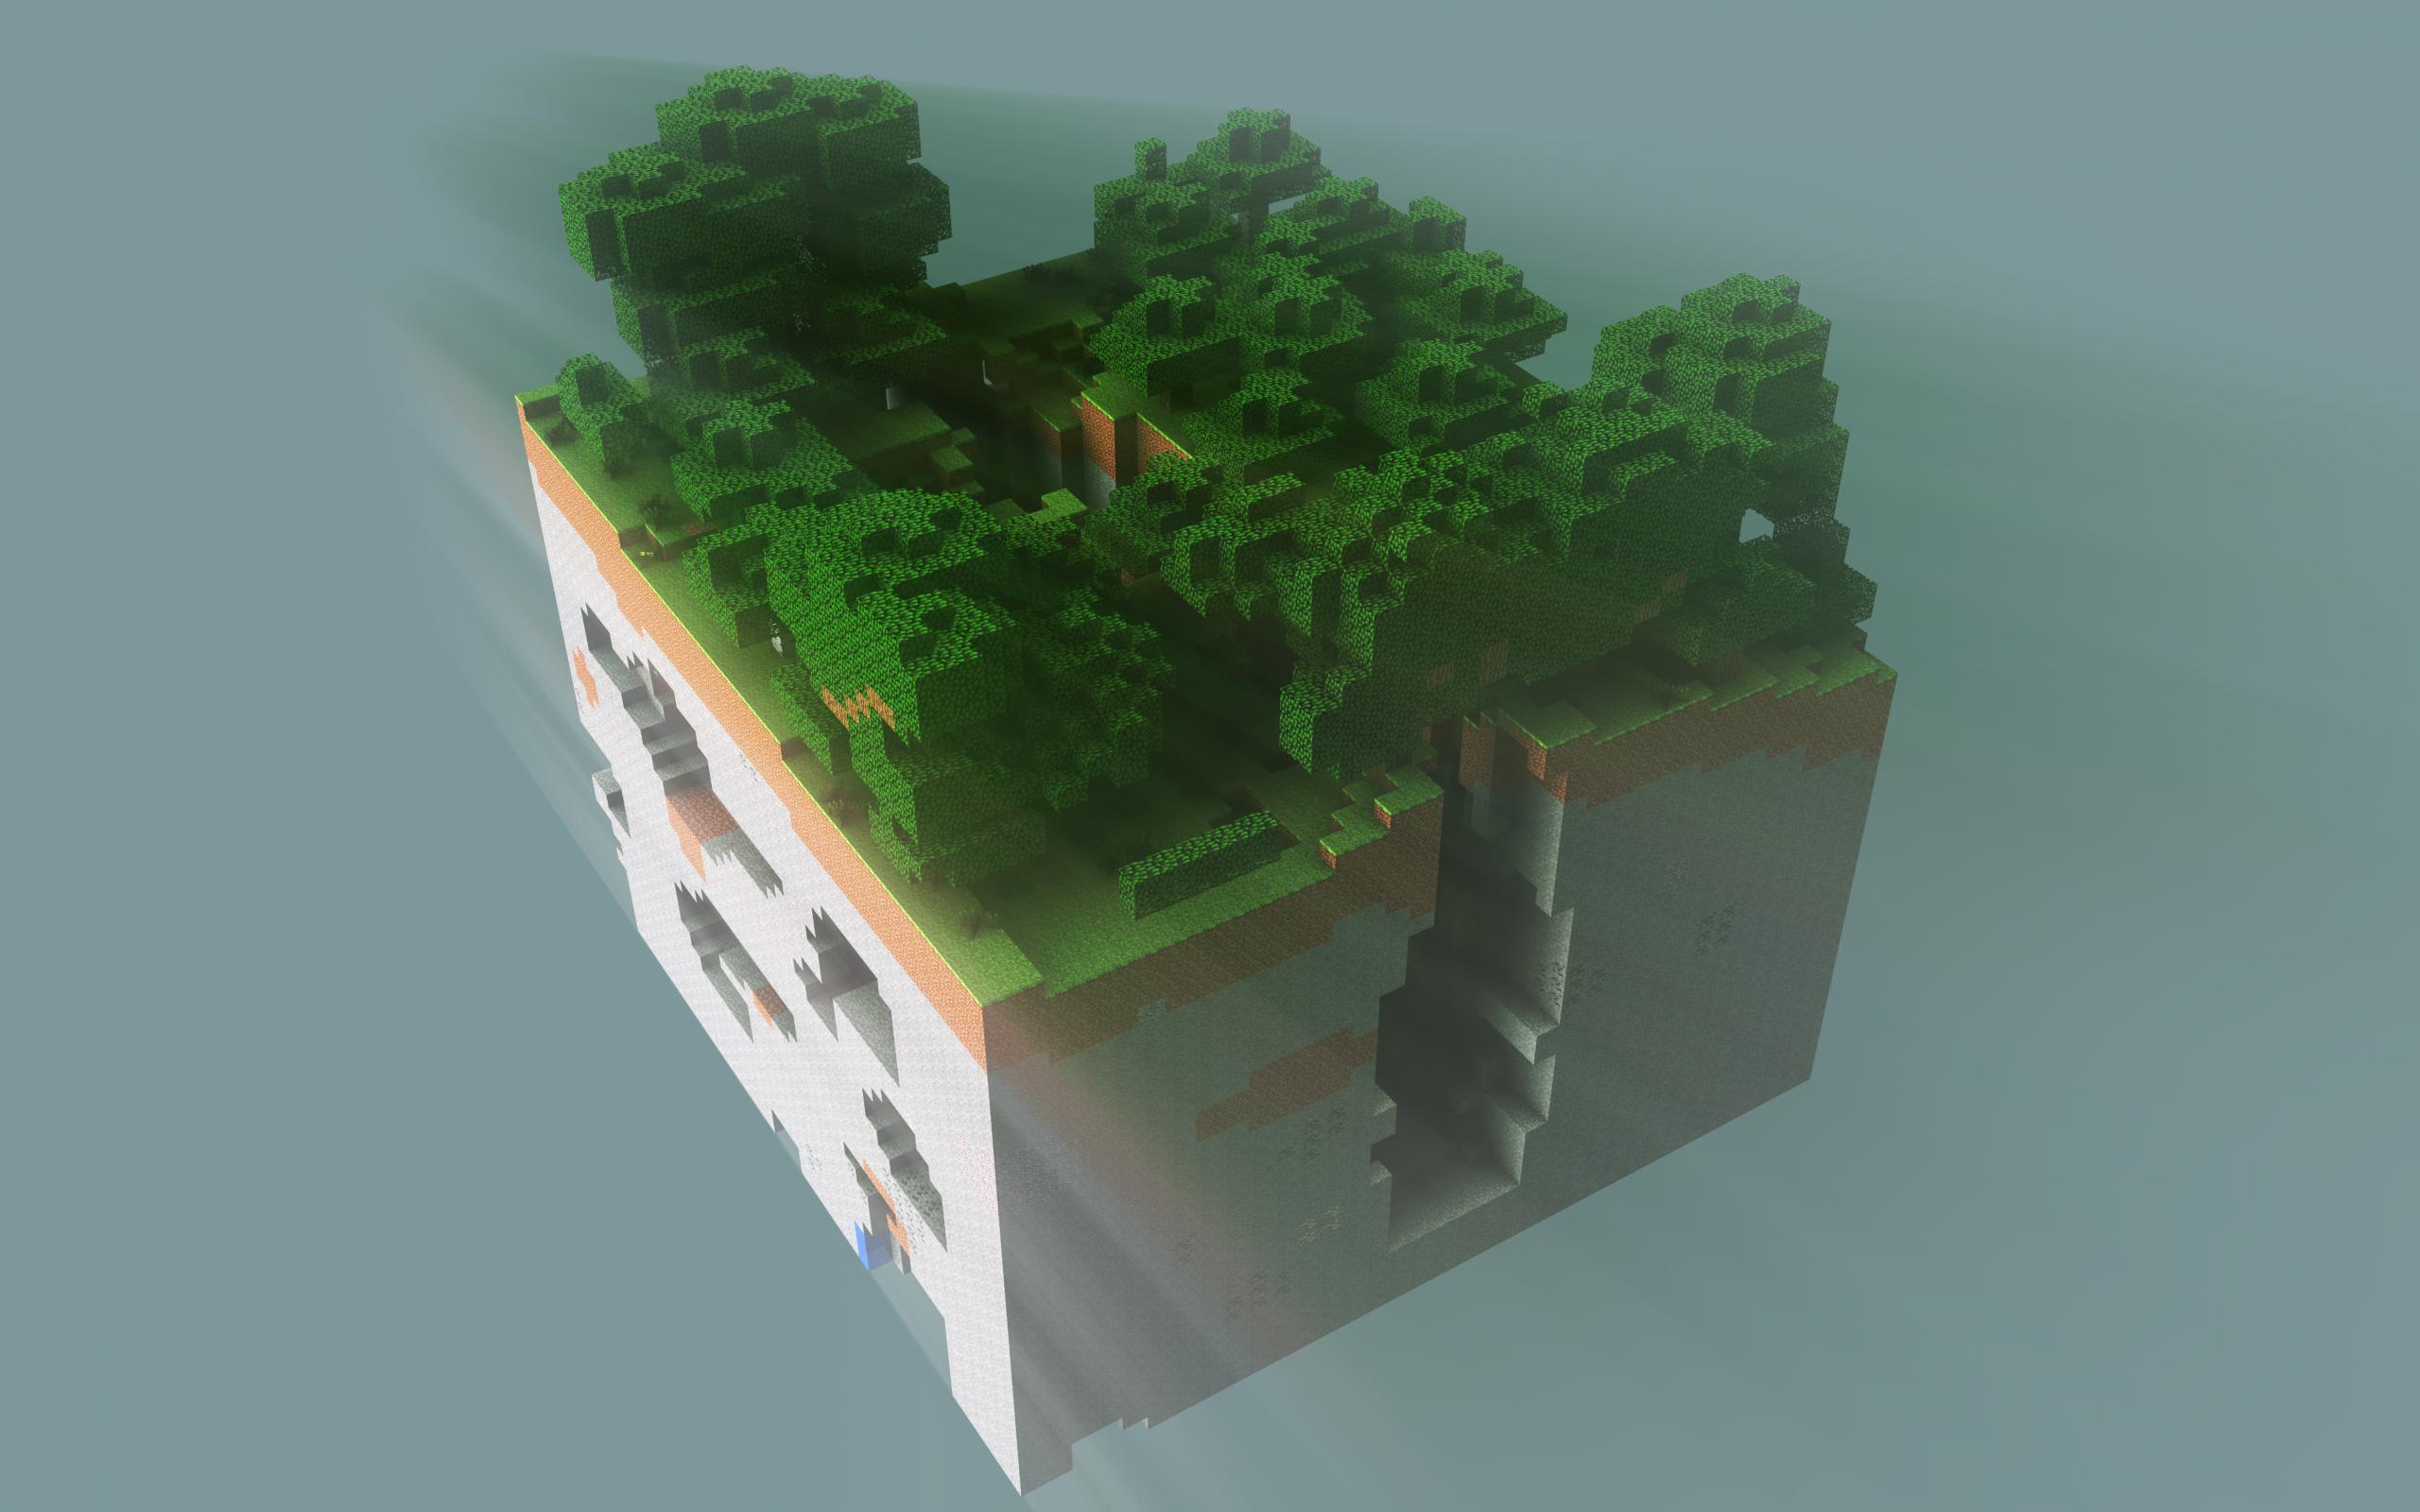 Minecraft Chunk Redone in Photoshop